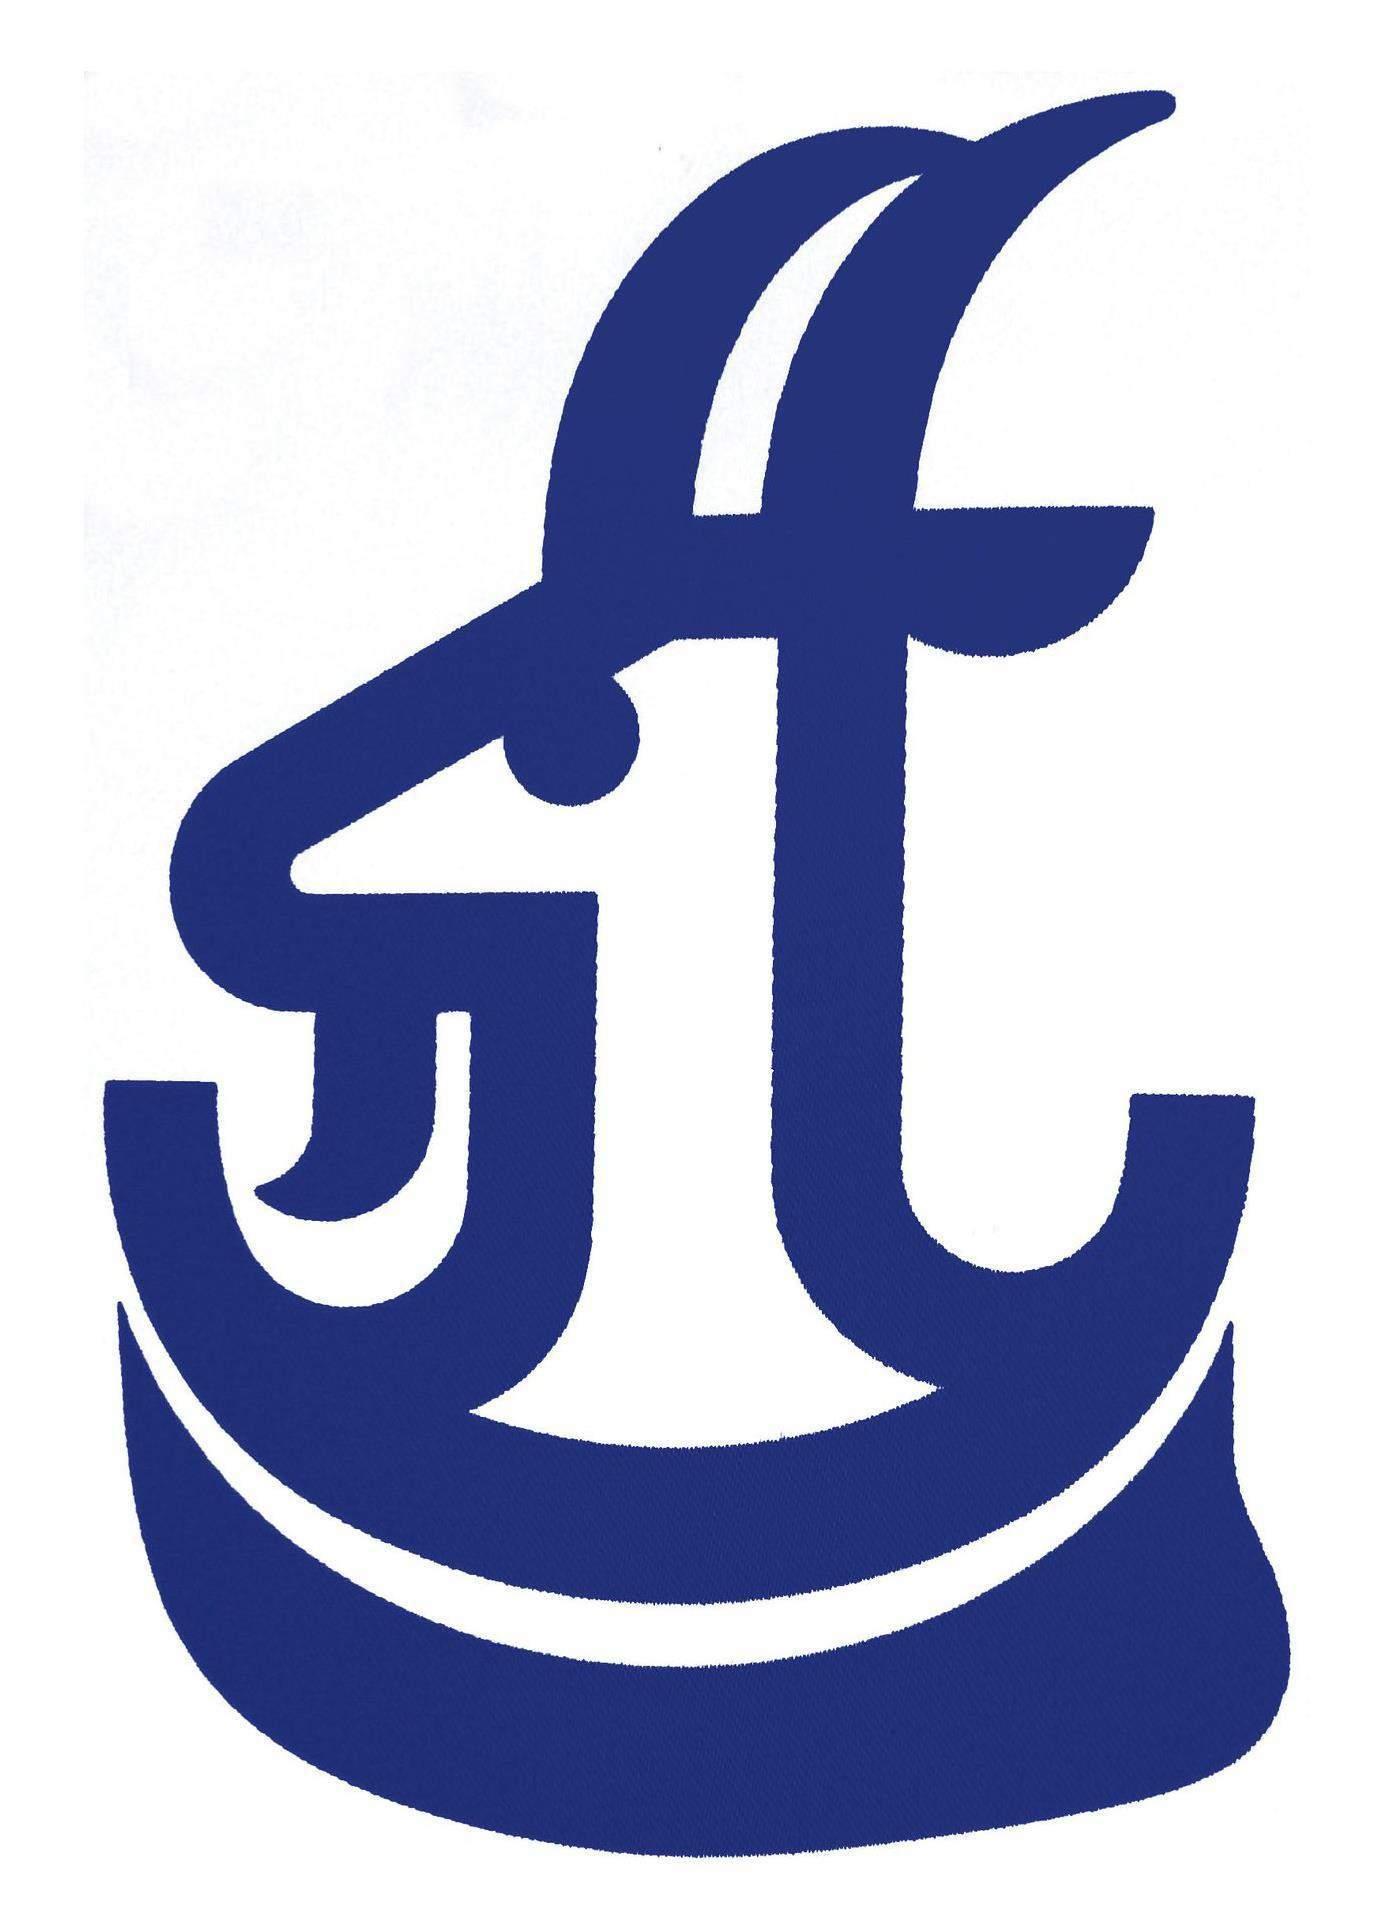 Pukinmäki logo